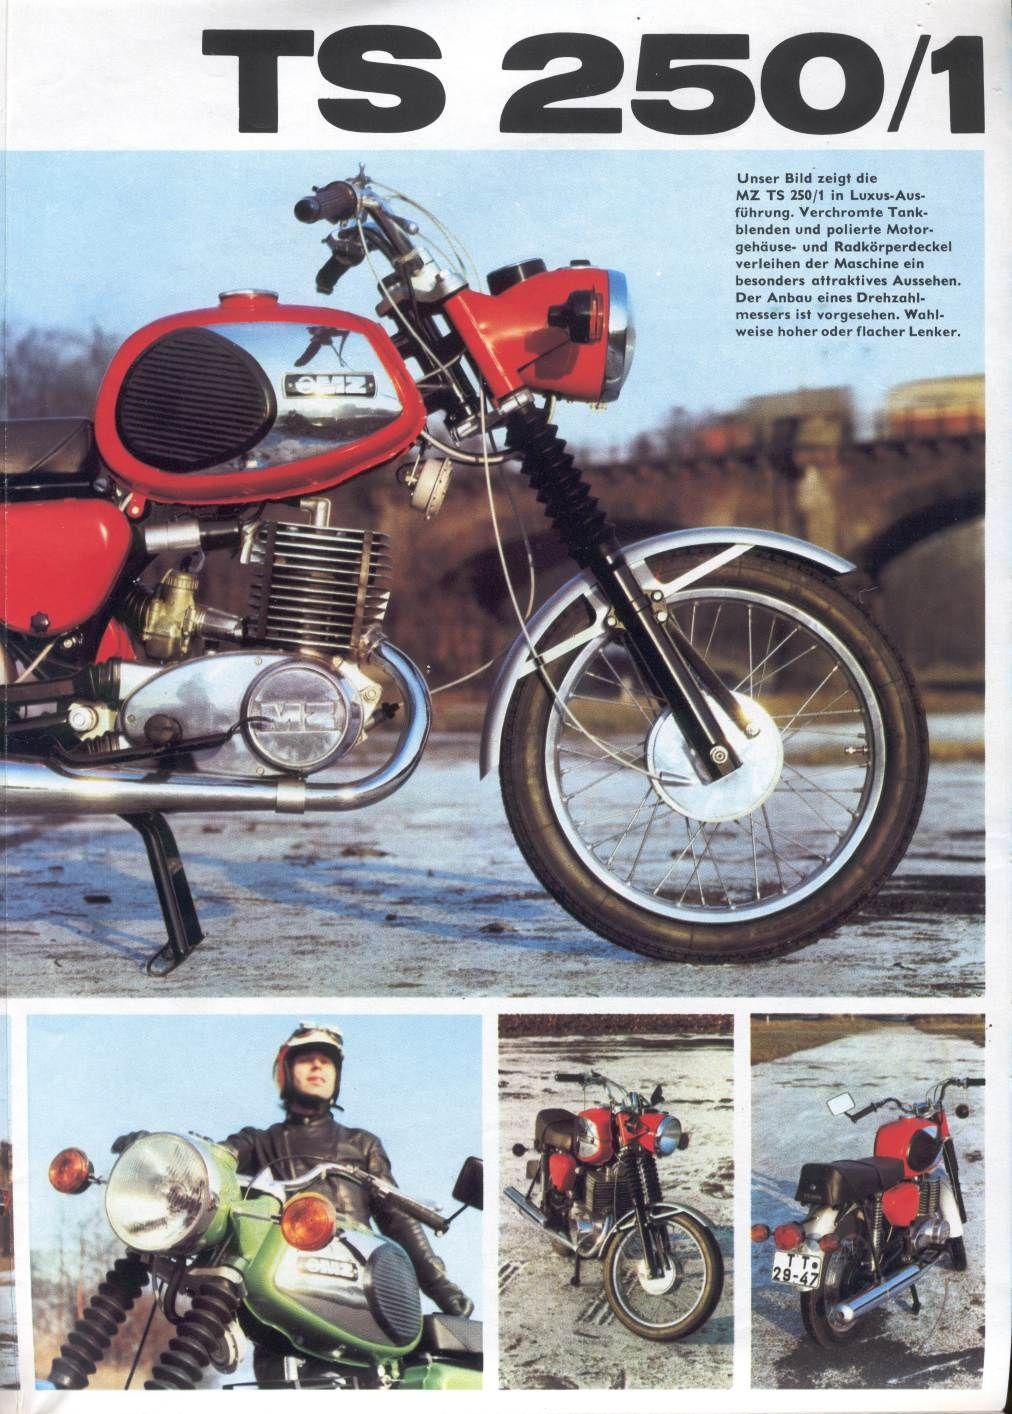 mz ts 250 1 album 2 wheels junkies motorcycle. Black Bedroom Furniture Sets. Home Design Ideas